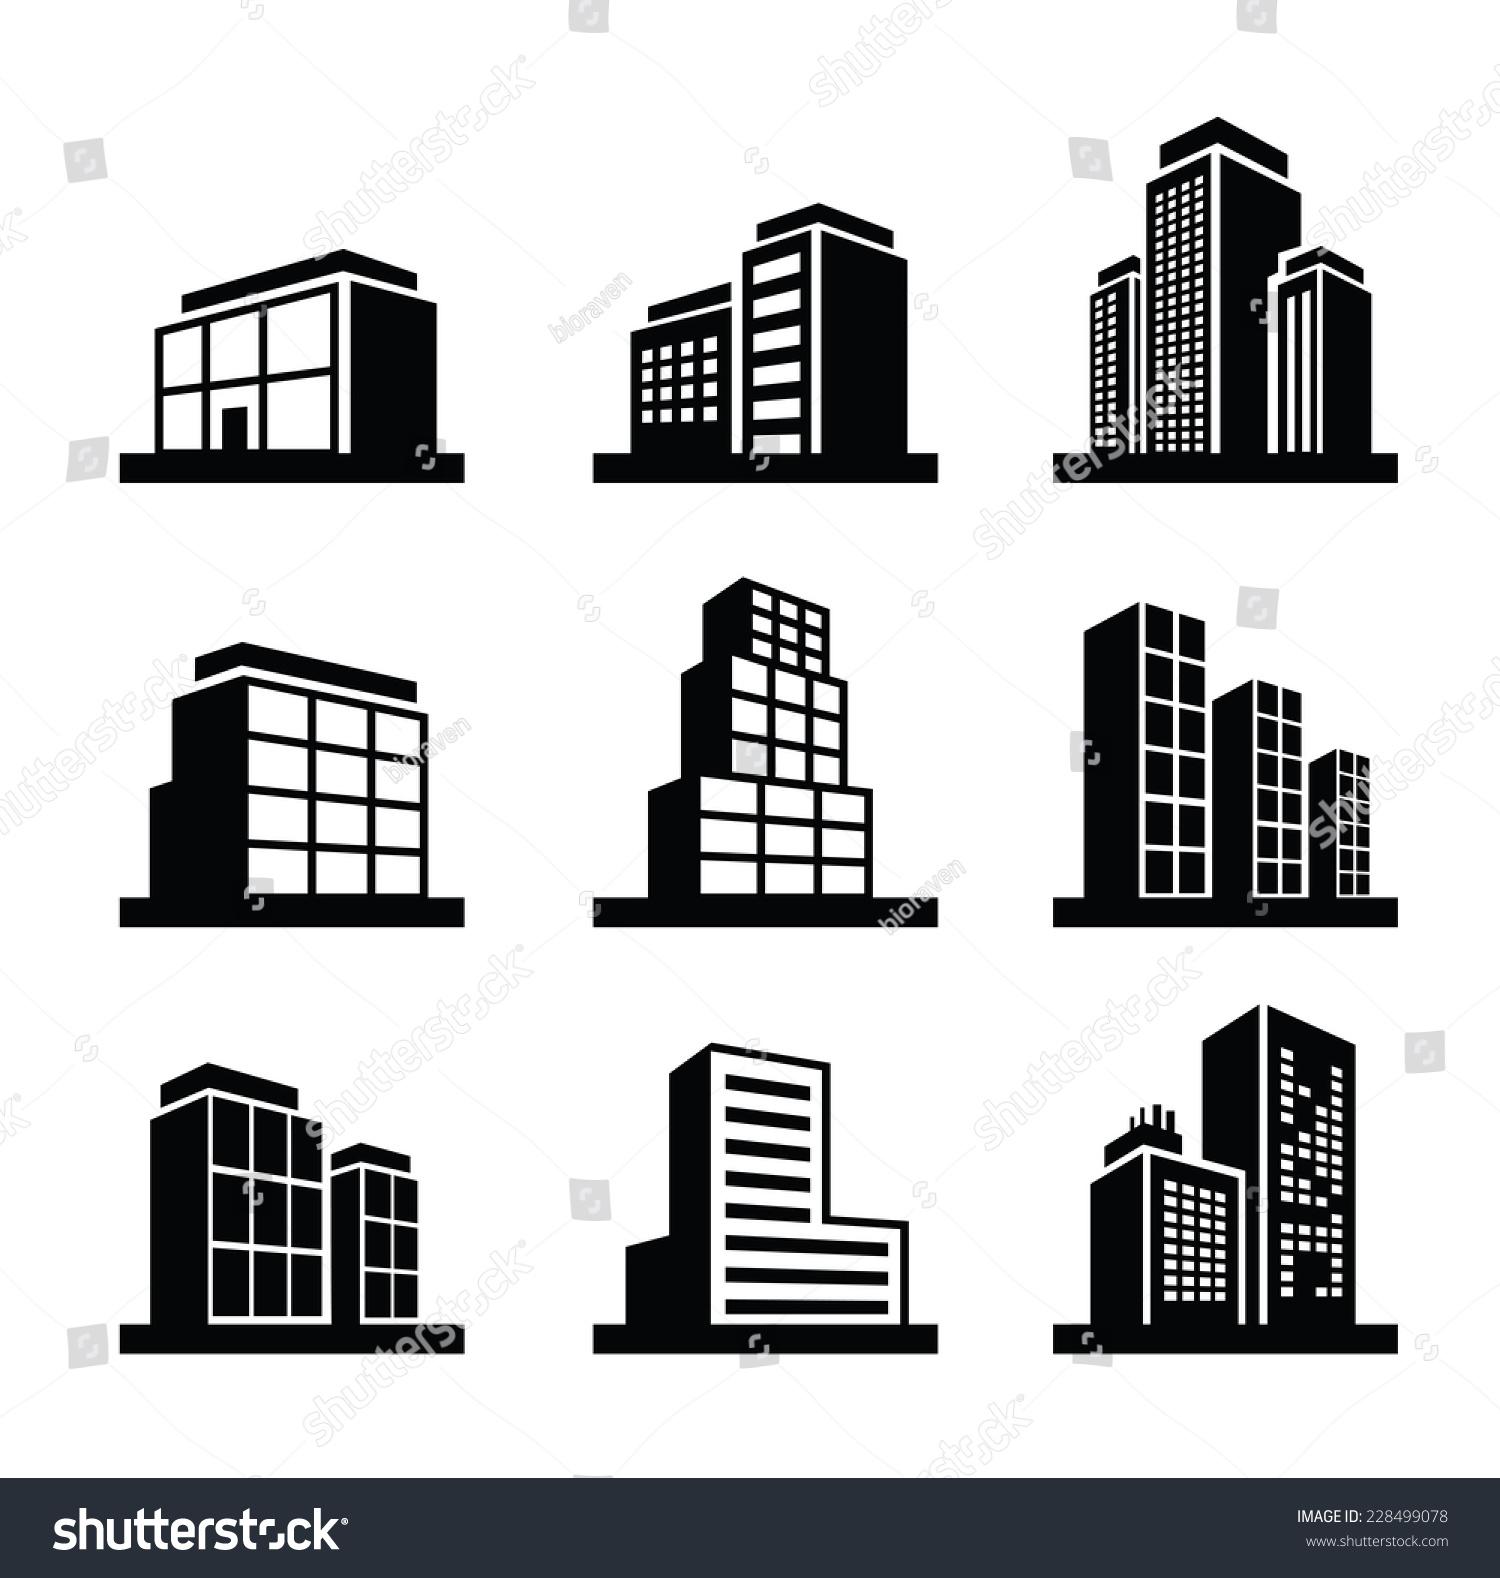 vector black illustration building icon on stock vector